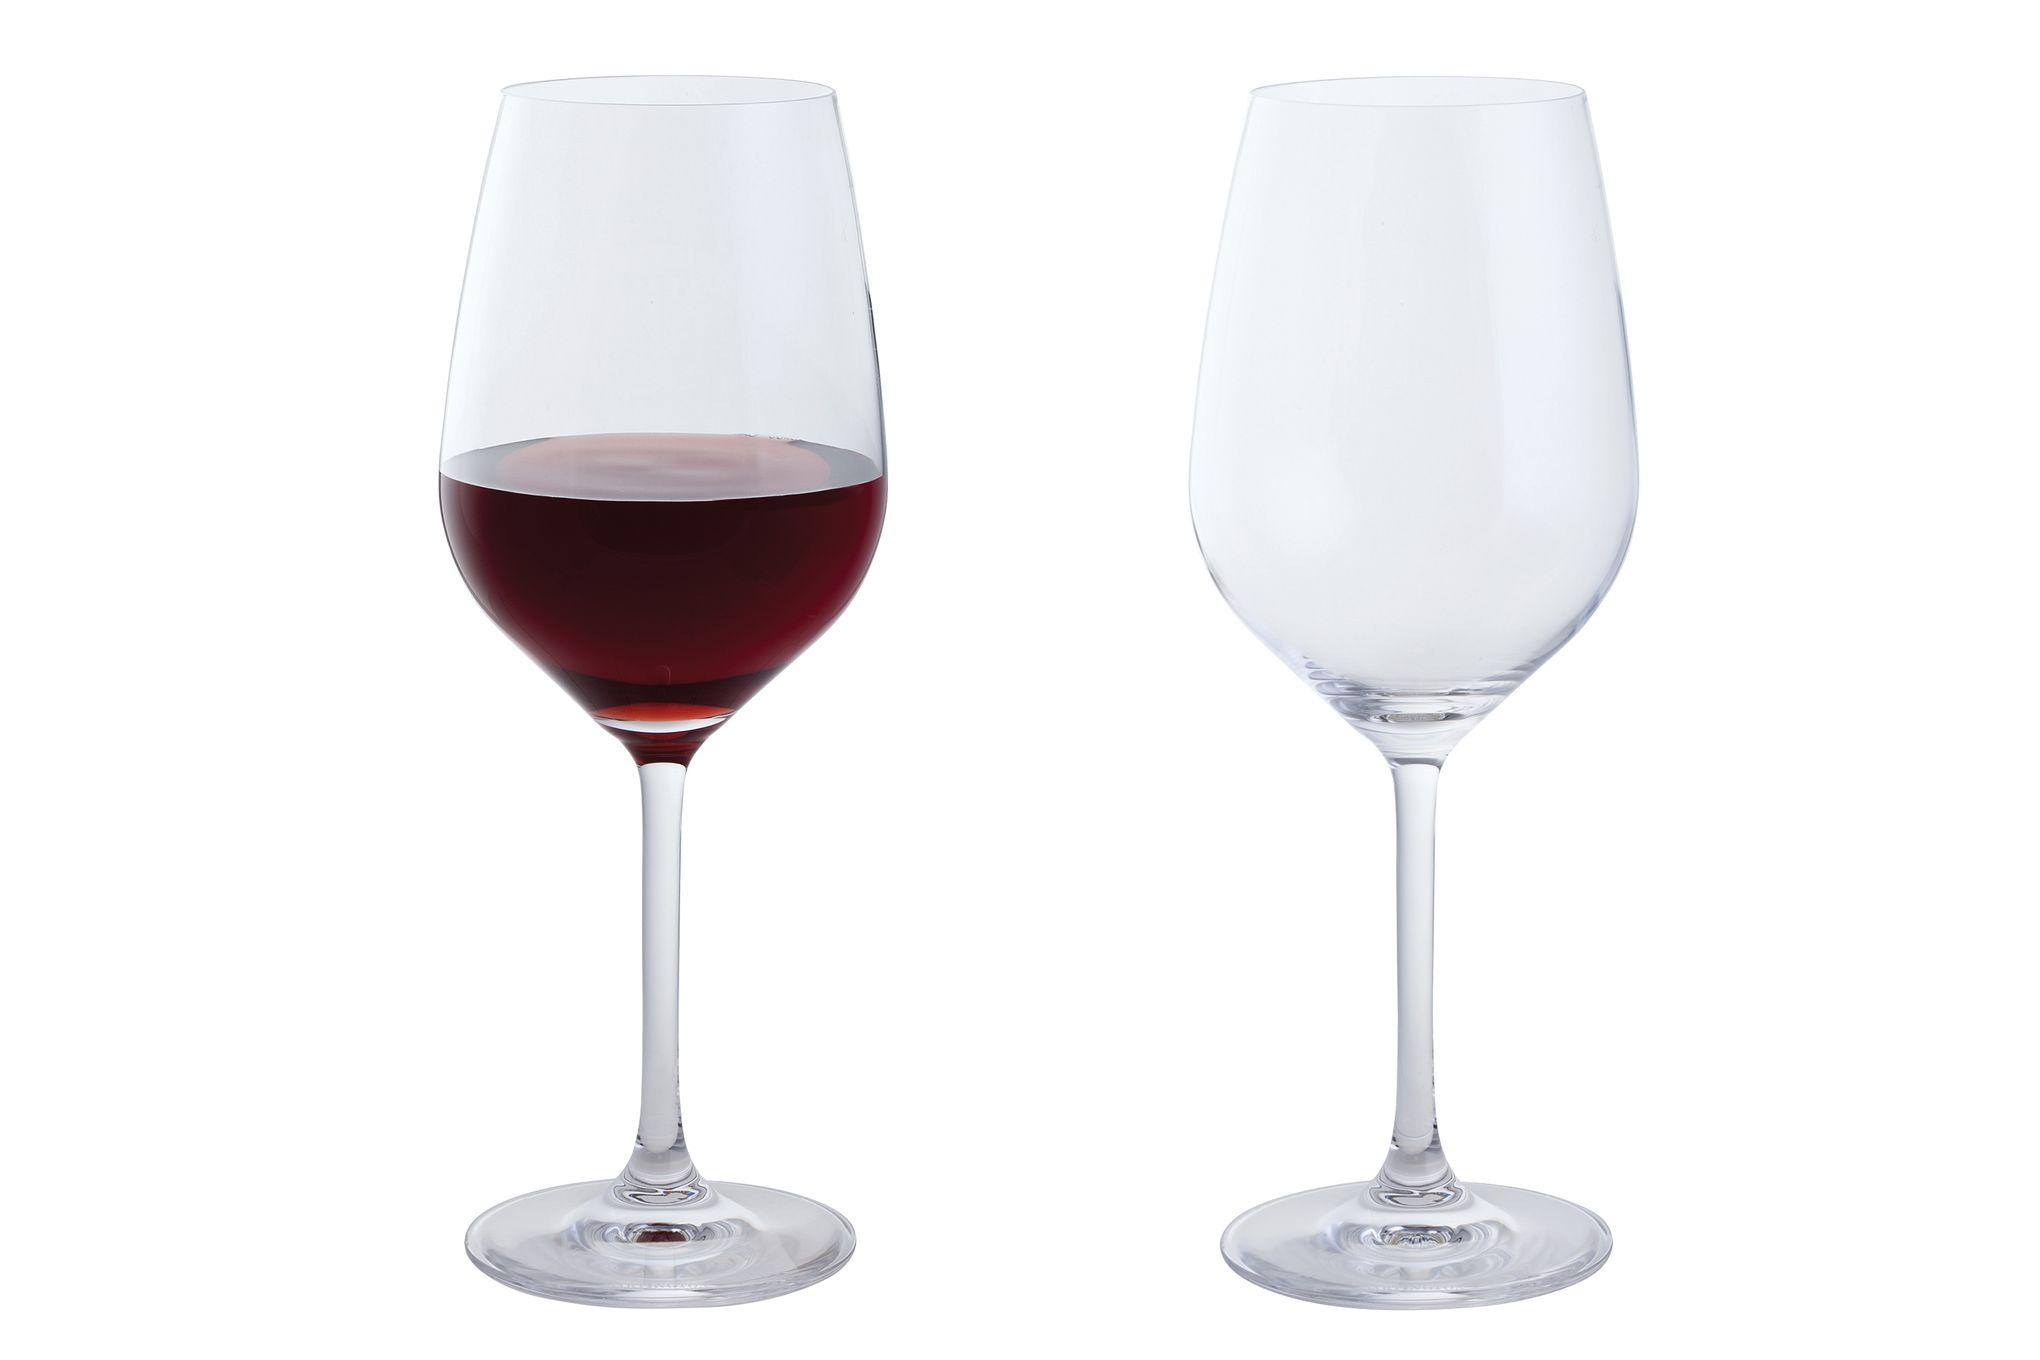 Dartington Crystal Wine & Bar Pair of Red Wine Glasses 490ml thumb 1